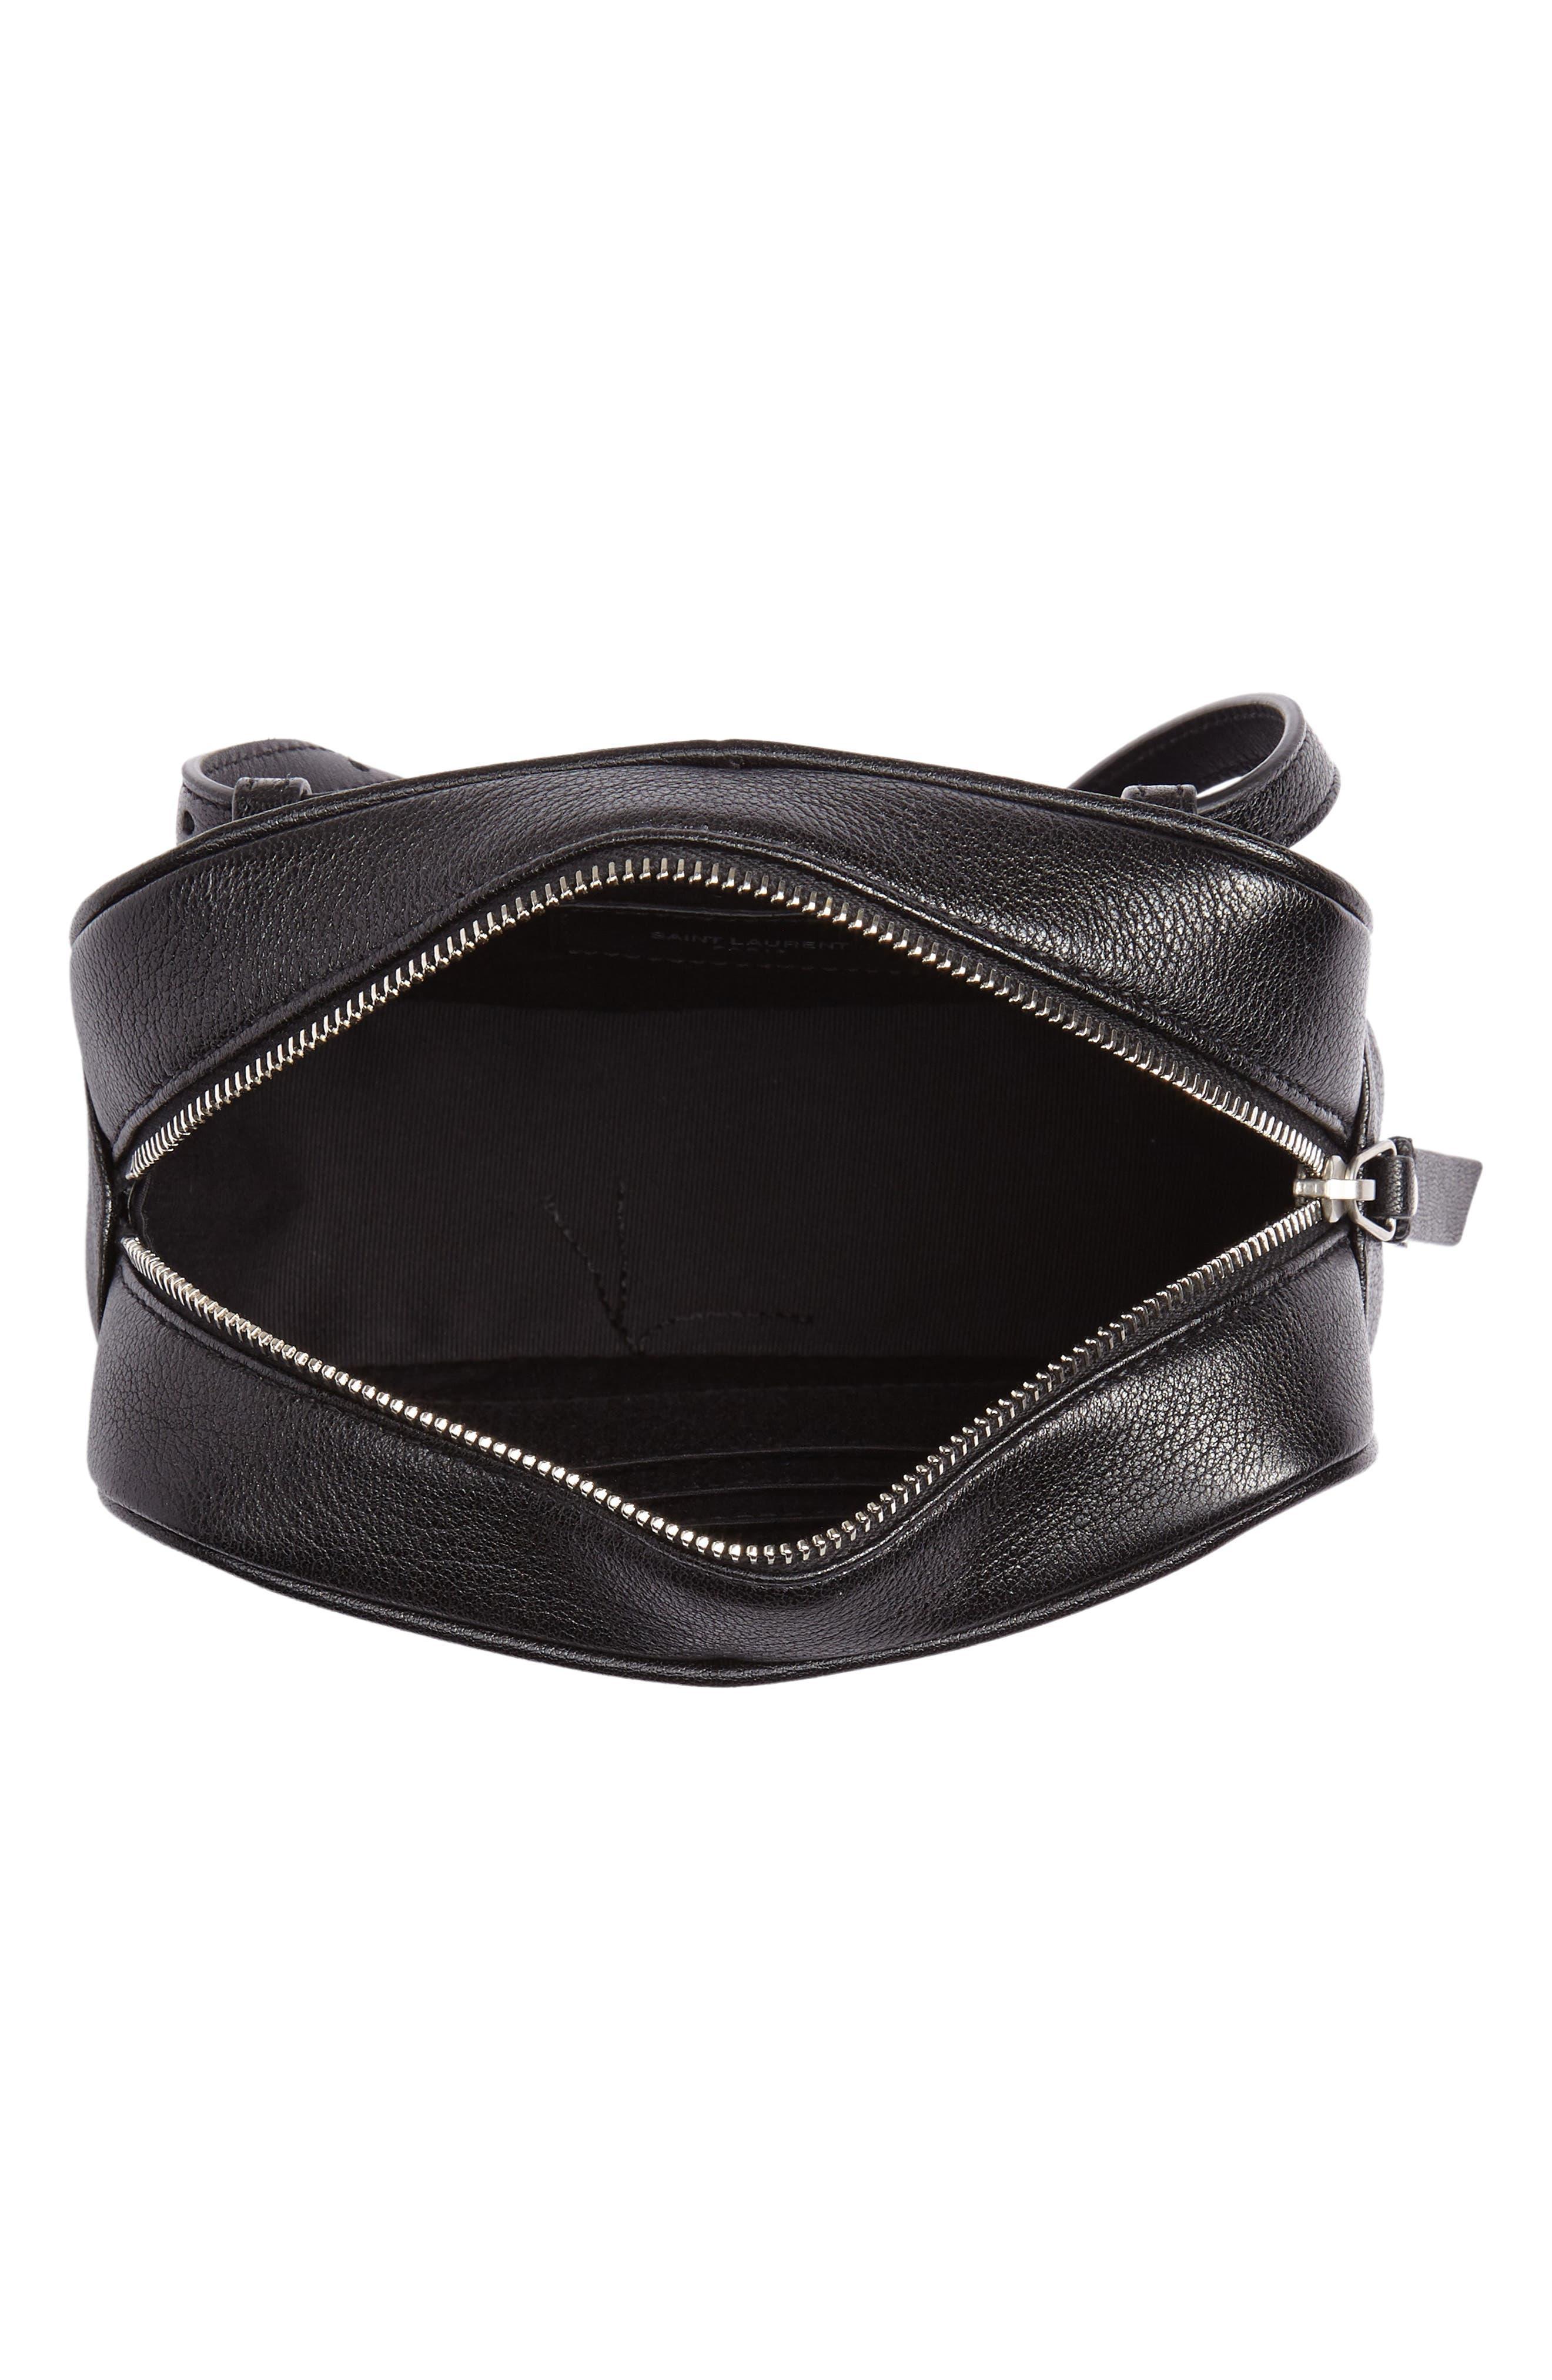 Loulou Tassel Leather Belt Bag,                             Alternate thumbnail 6, color,                             001